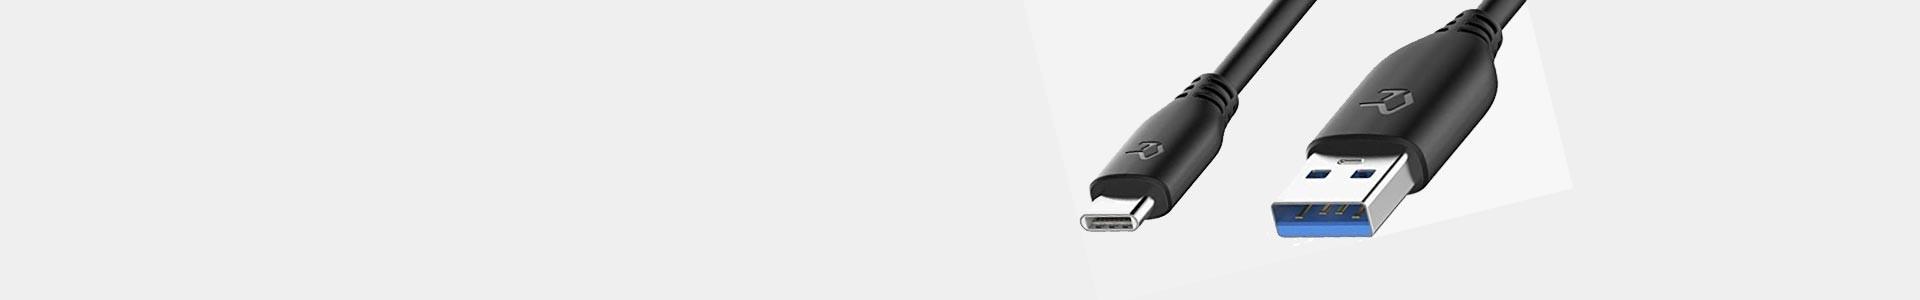 USB connectors for professional applications - Avacab